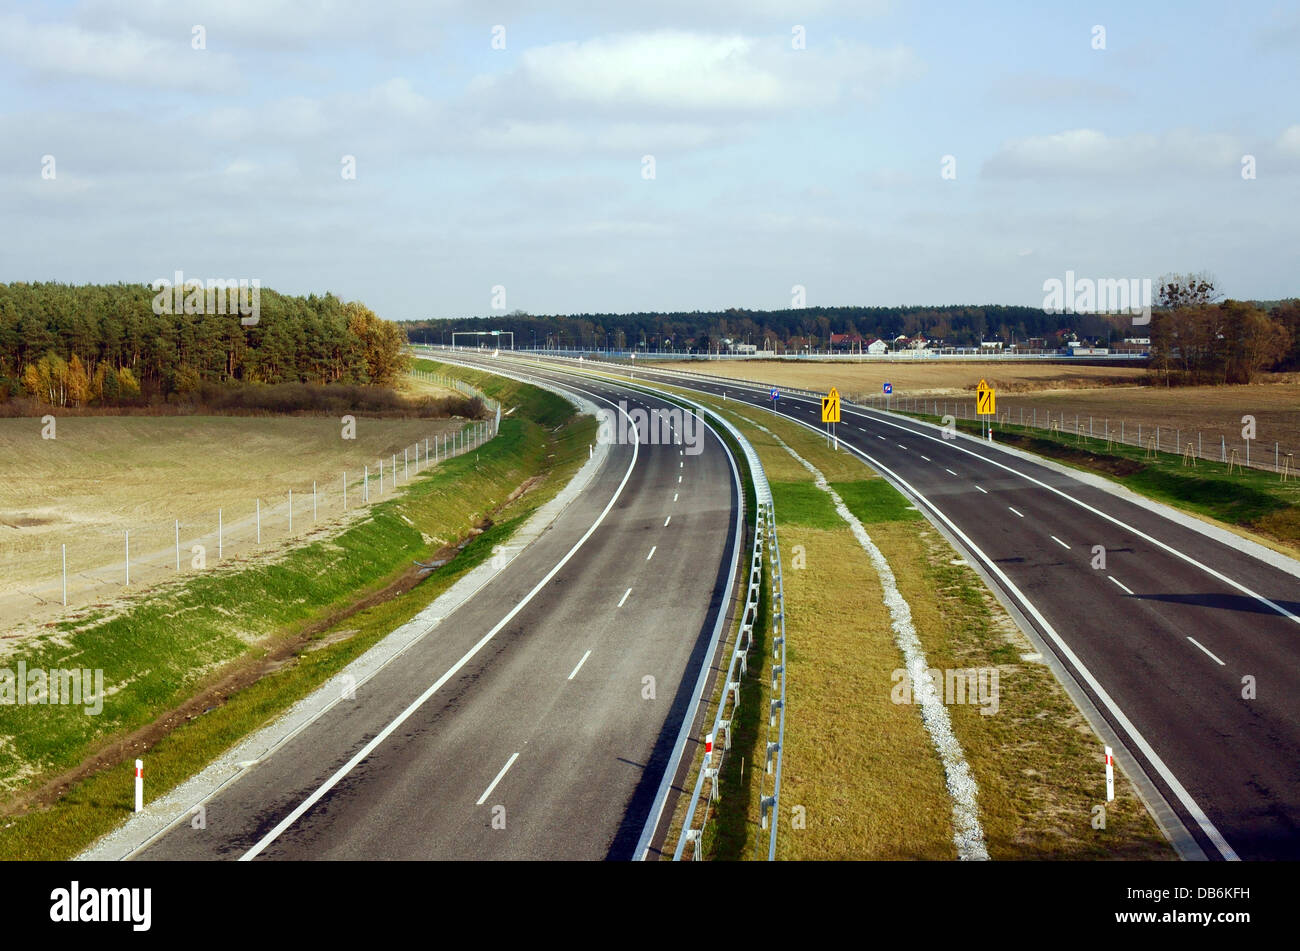 orbital road under construction in Poznan, Poland, october 2012 - Stock Image